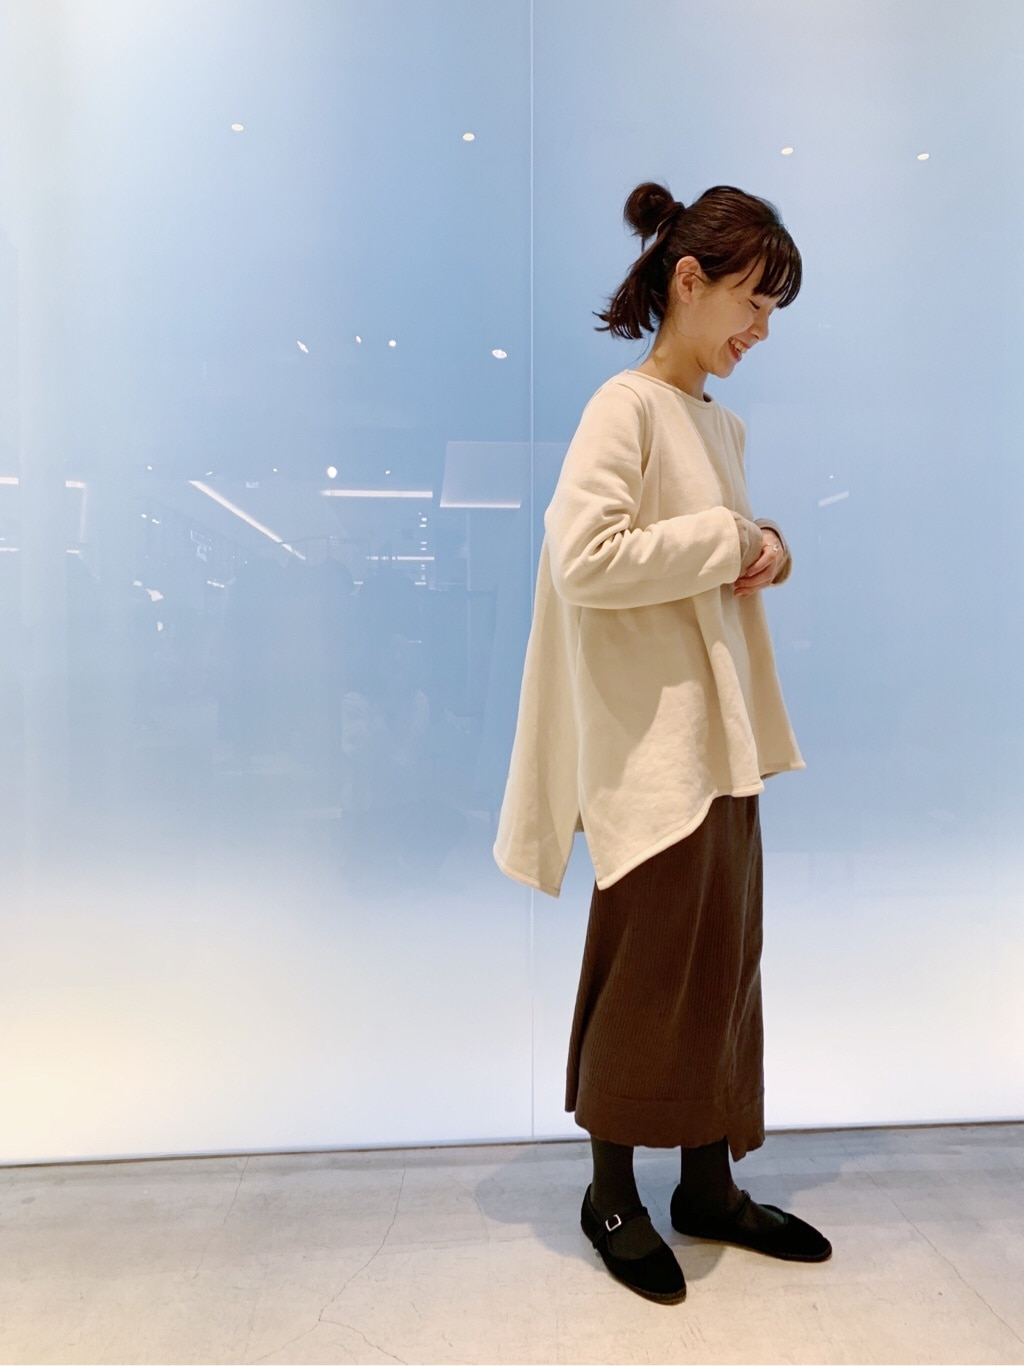 note et silence. 日本橋��島屋S.C. 身長:162cm 2019.12.02